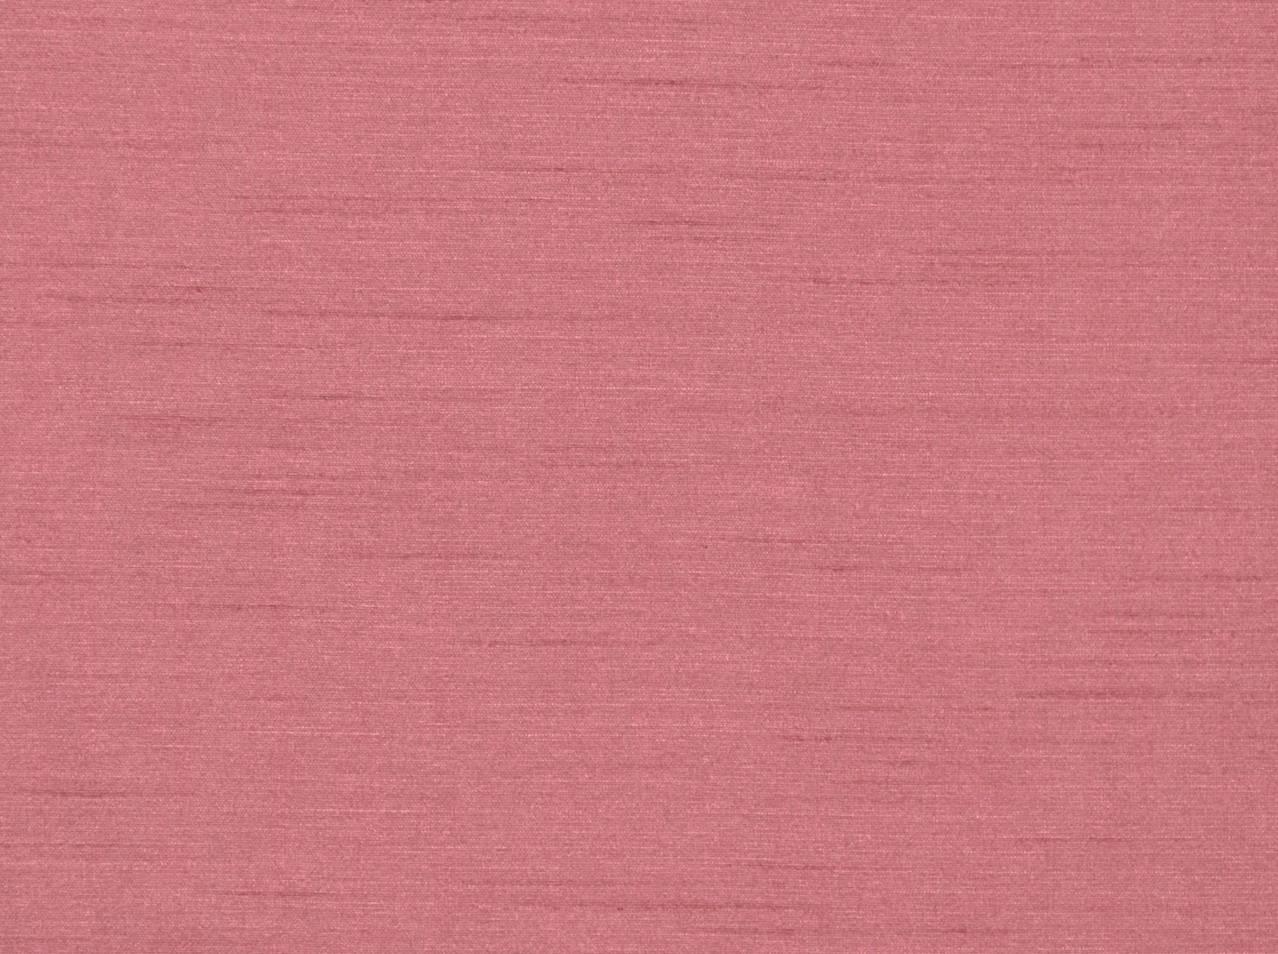 Cascade Yarns 220 Dusty Rose Color 8114